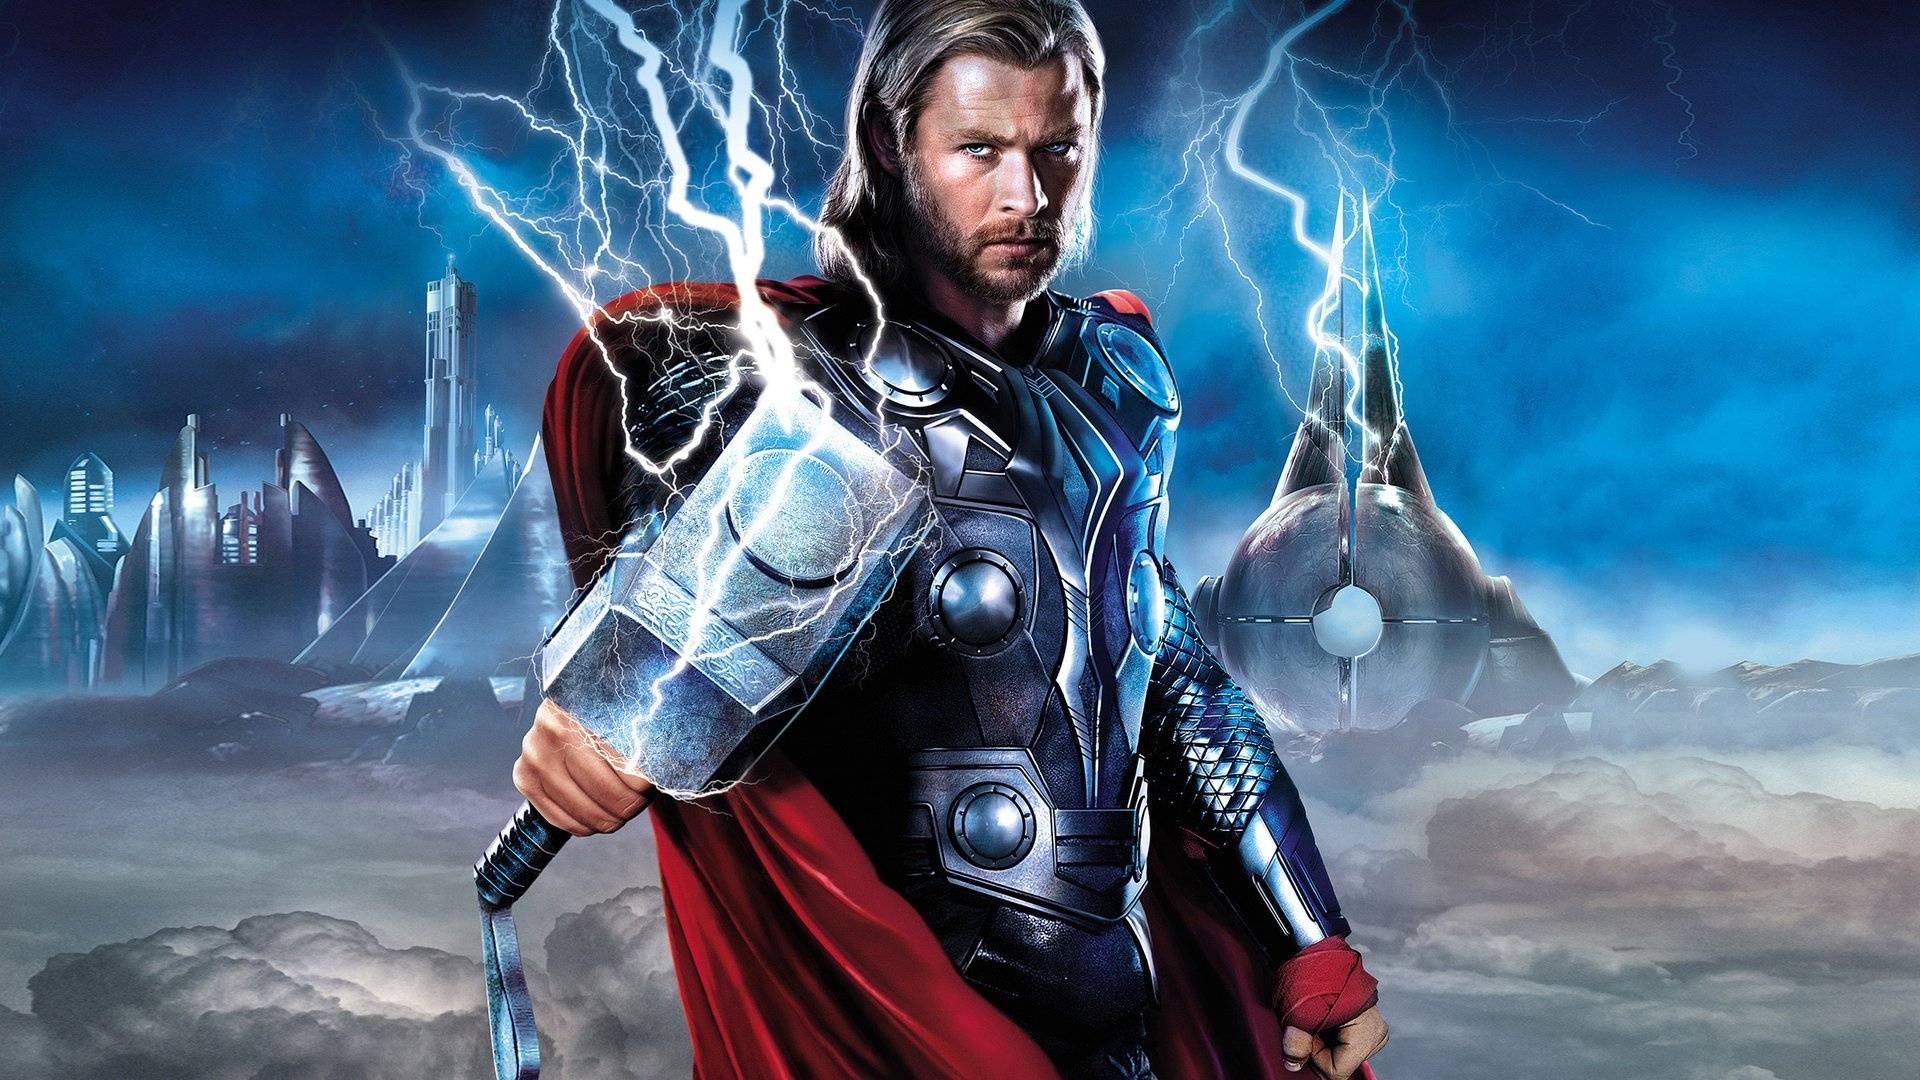 Thor hd background